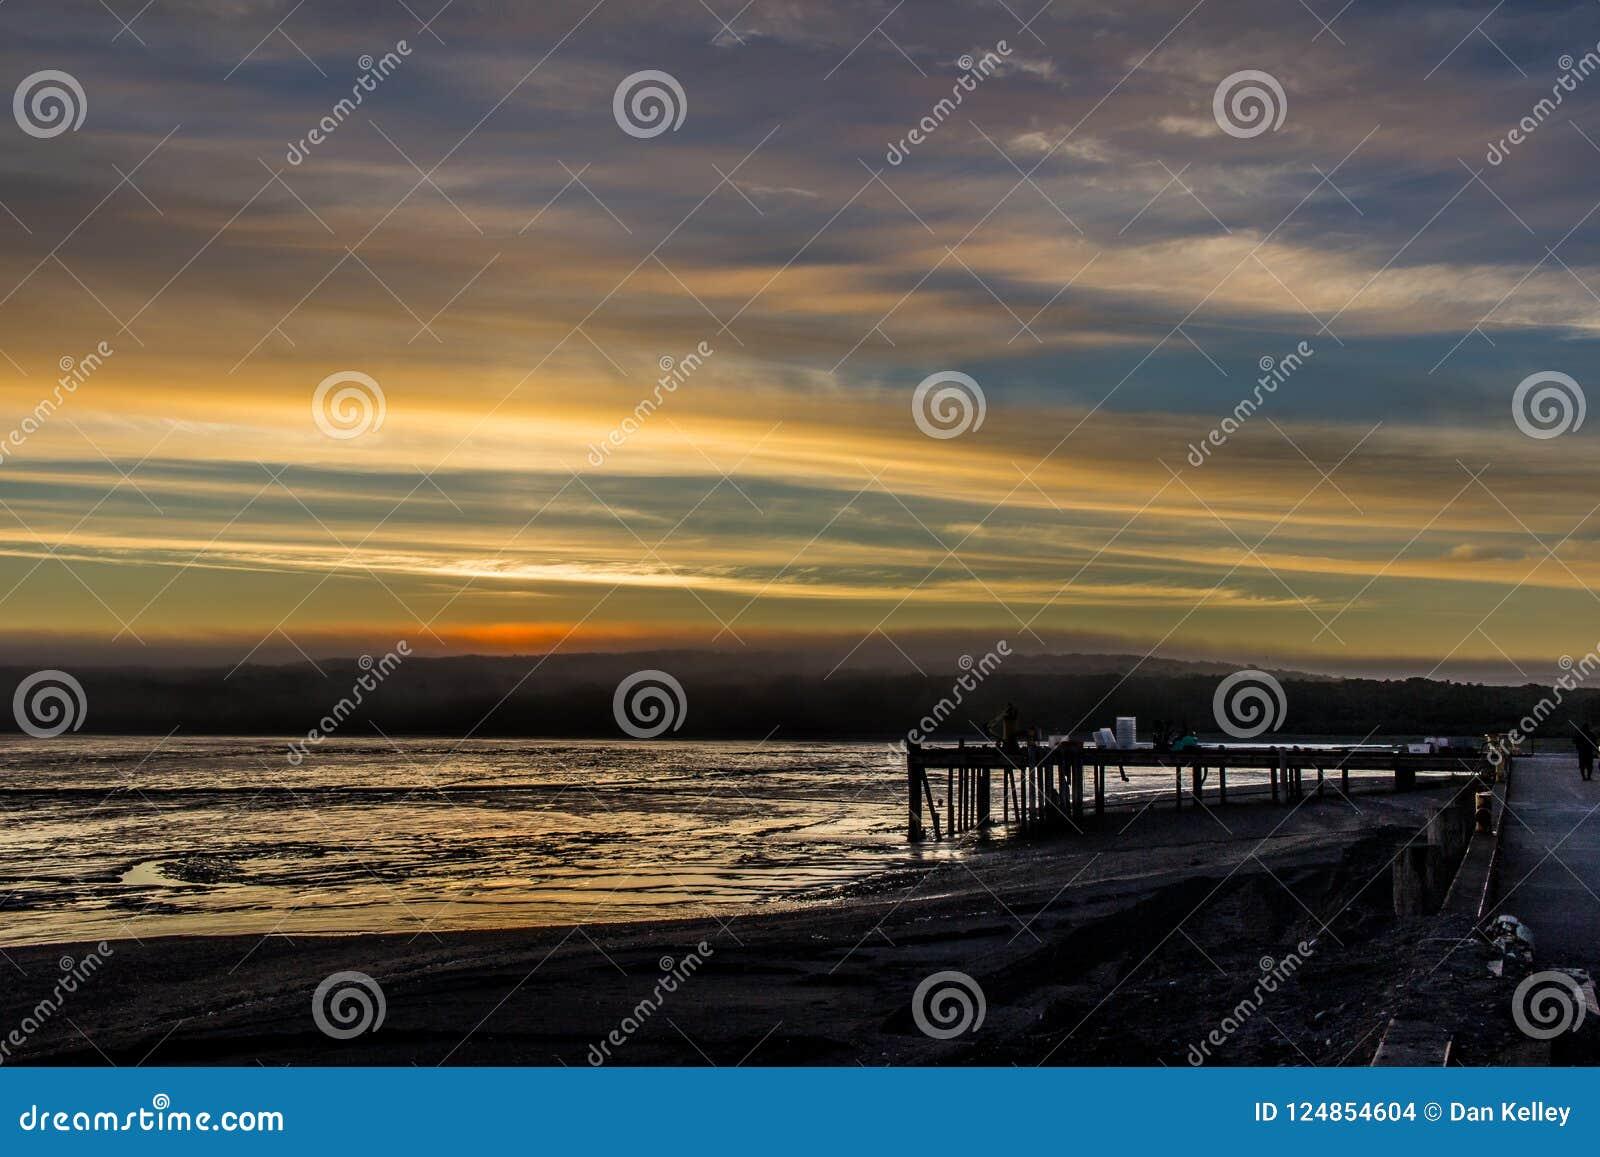 Sunrise over Bristol Bay from the dock at Ekuk Alaska at low tide.